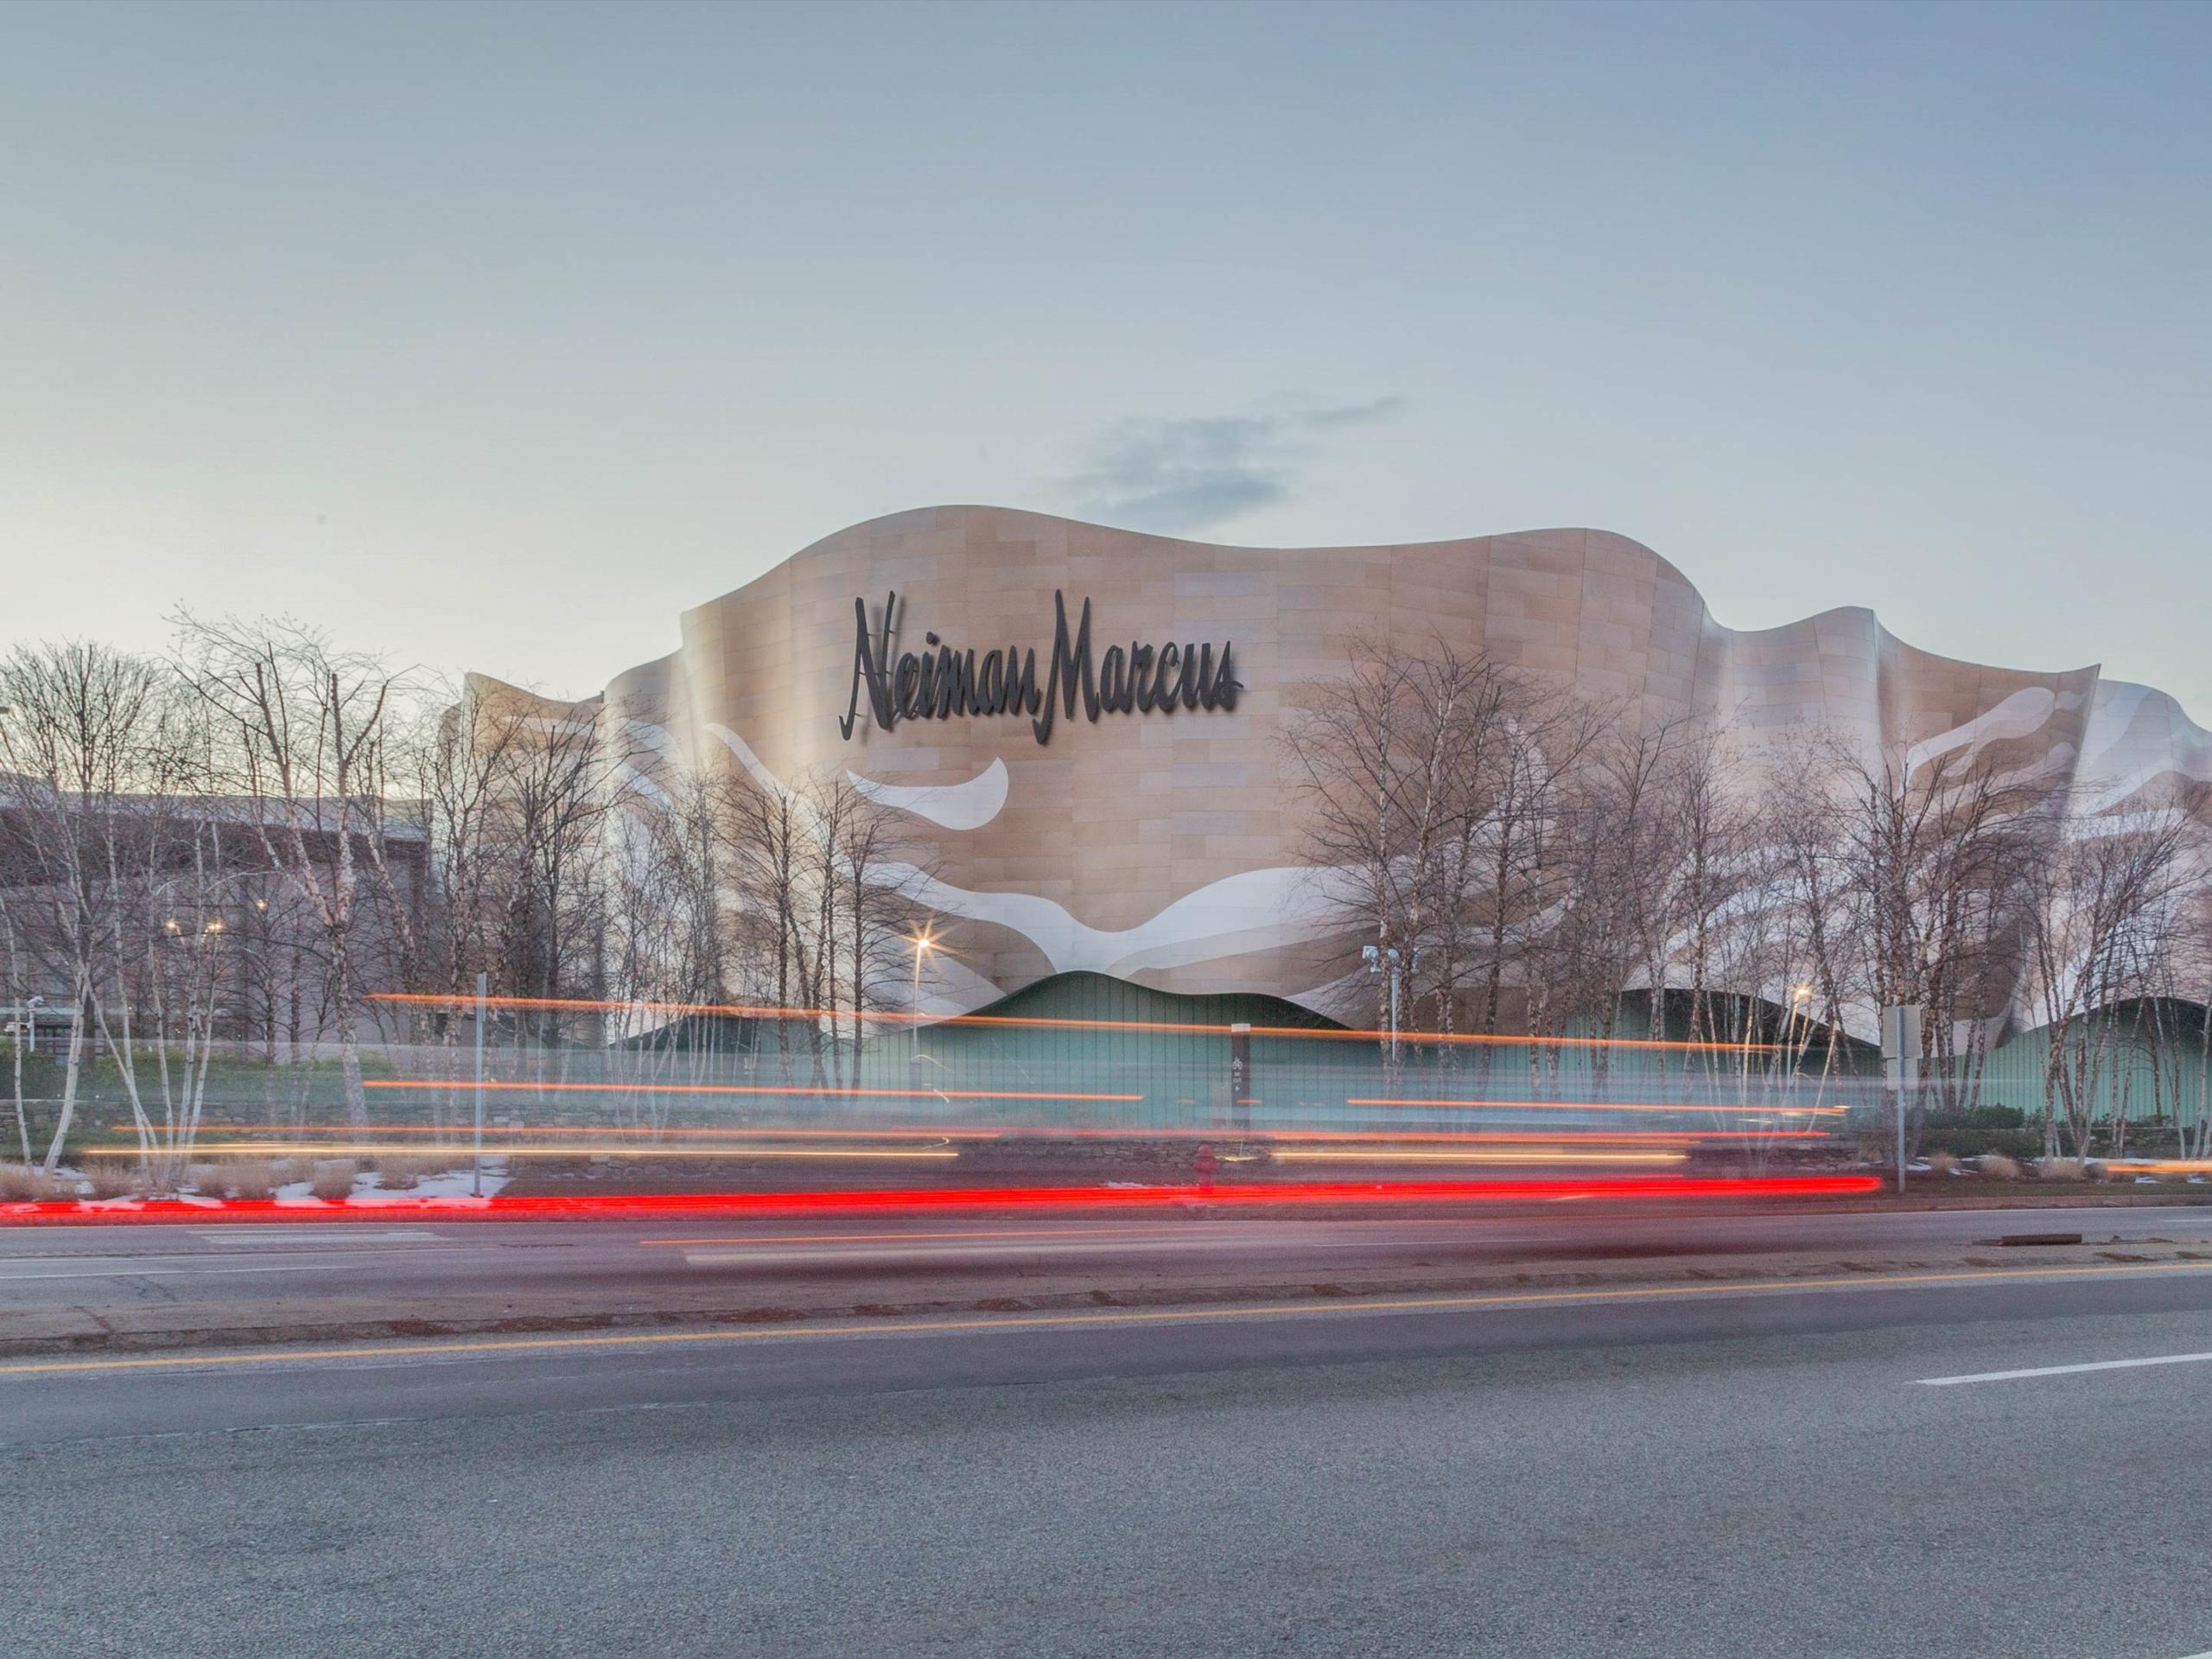 Neiman Marcus in Massachusetts, designed by Elkus Manfredi.